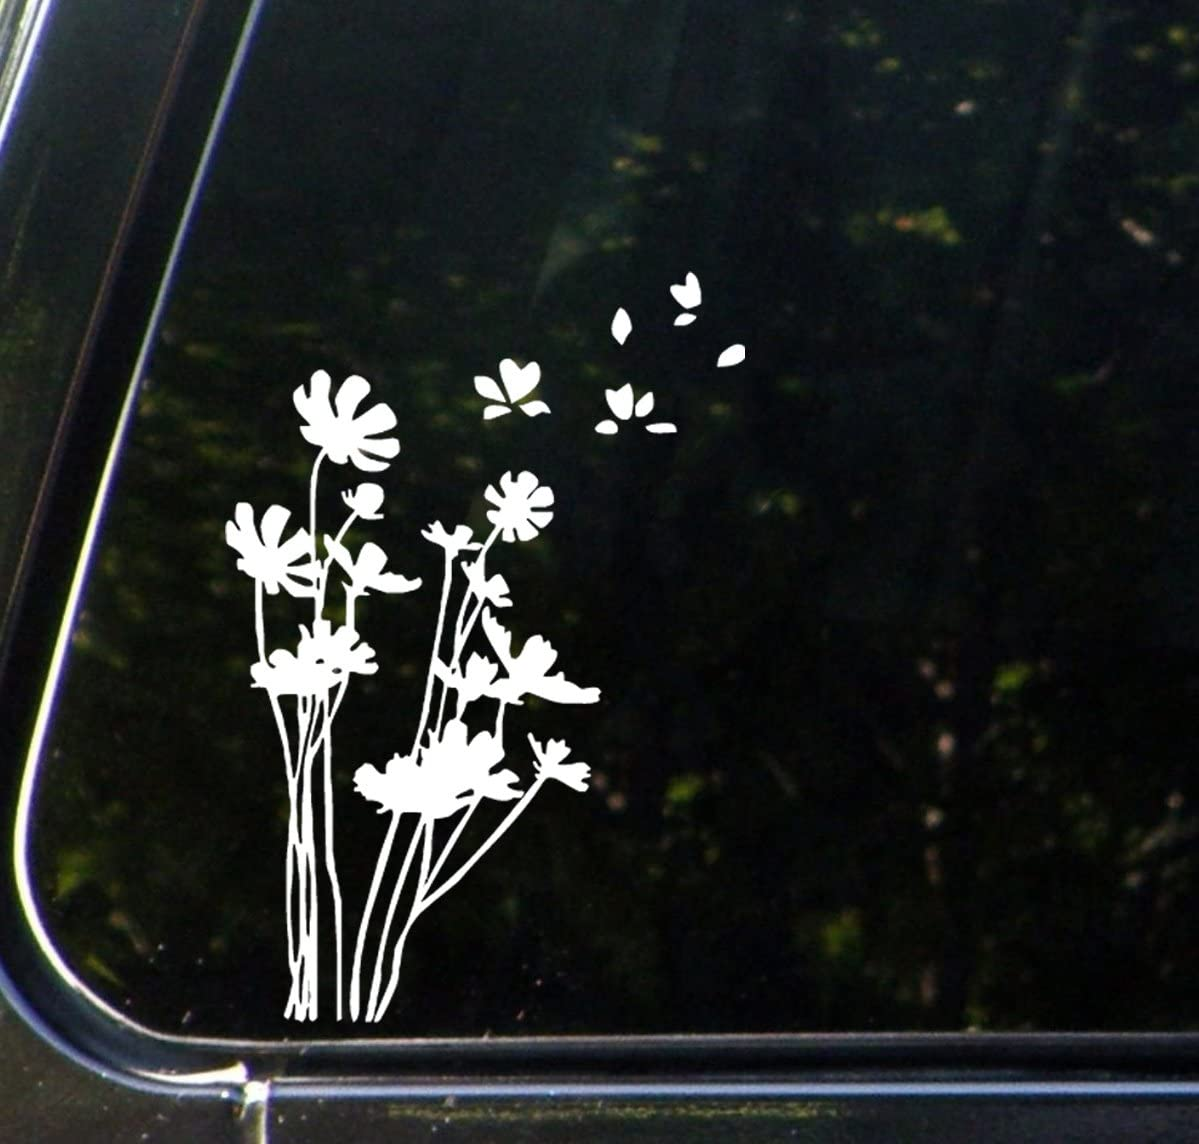 "Flowers in The Wind - Car Vinyl Decal Sticker - (5.25""w x 7.5""h) (White)"